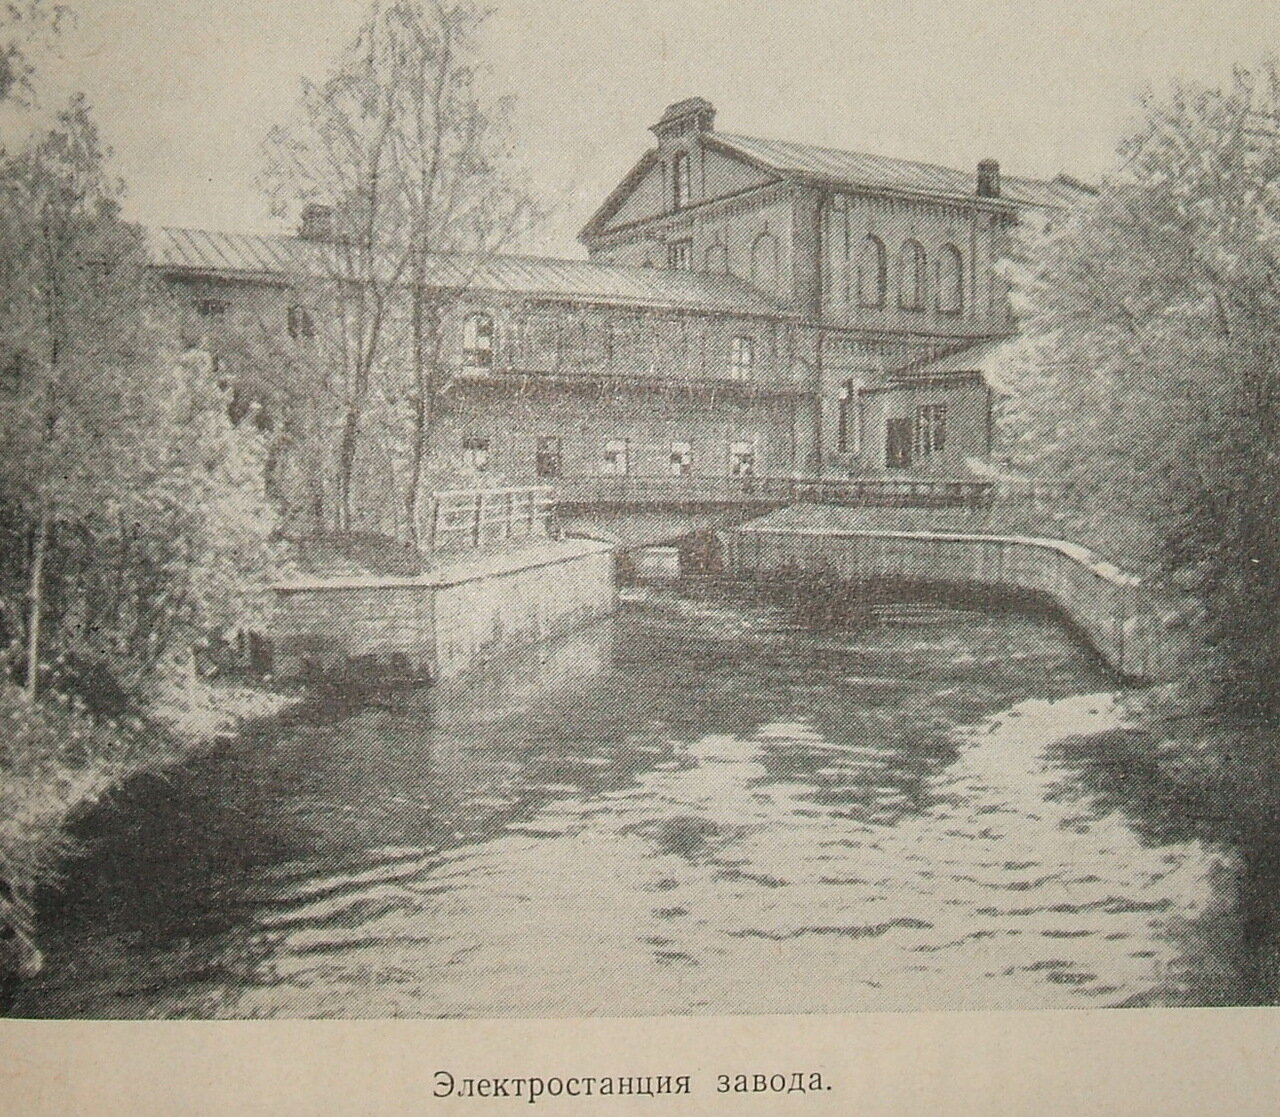 Электростанция завода СИЗ